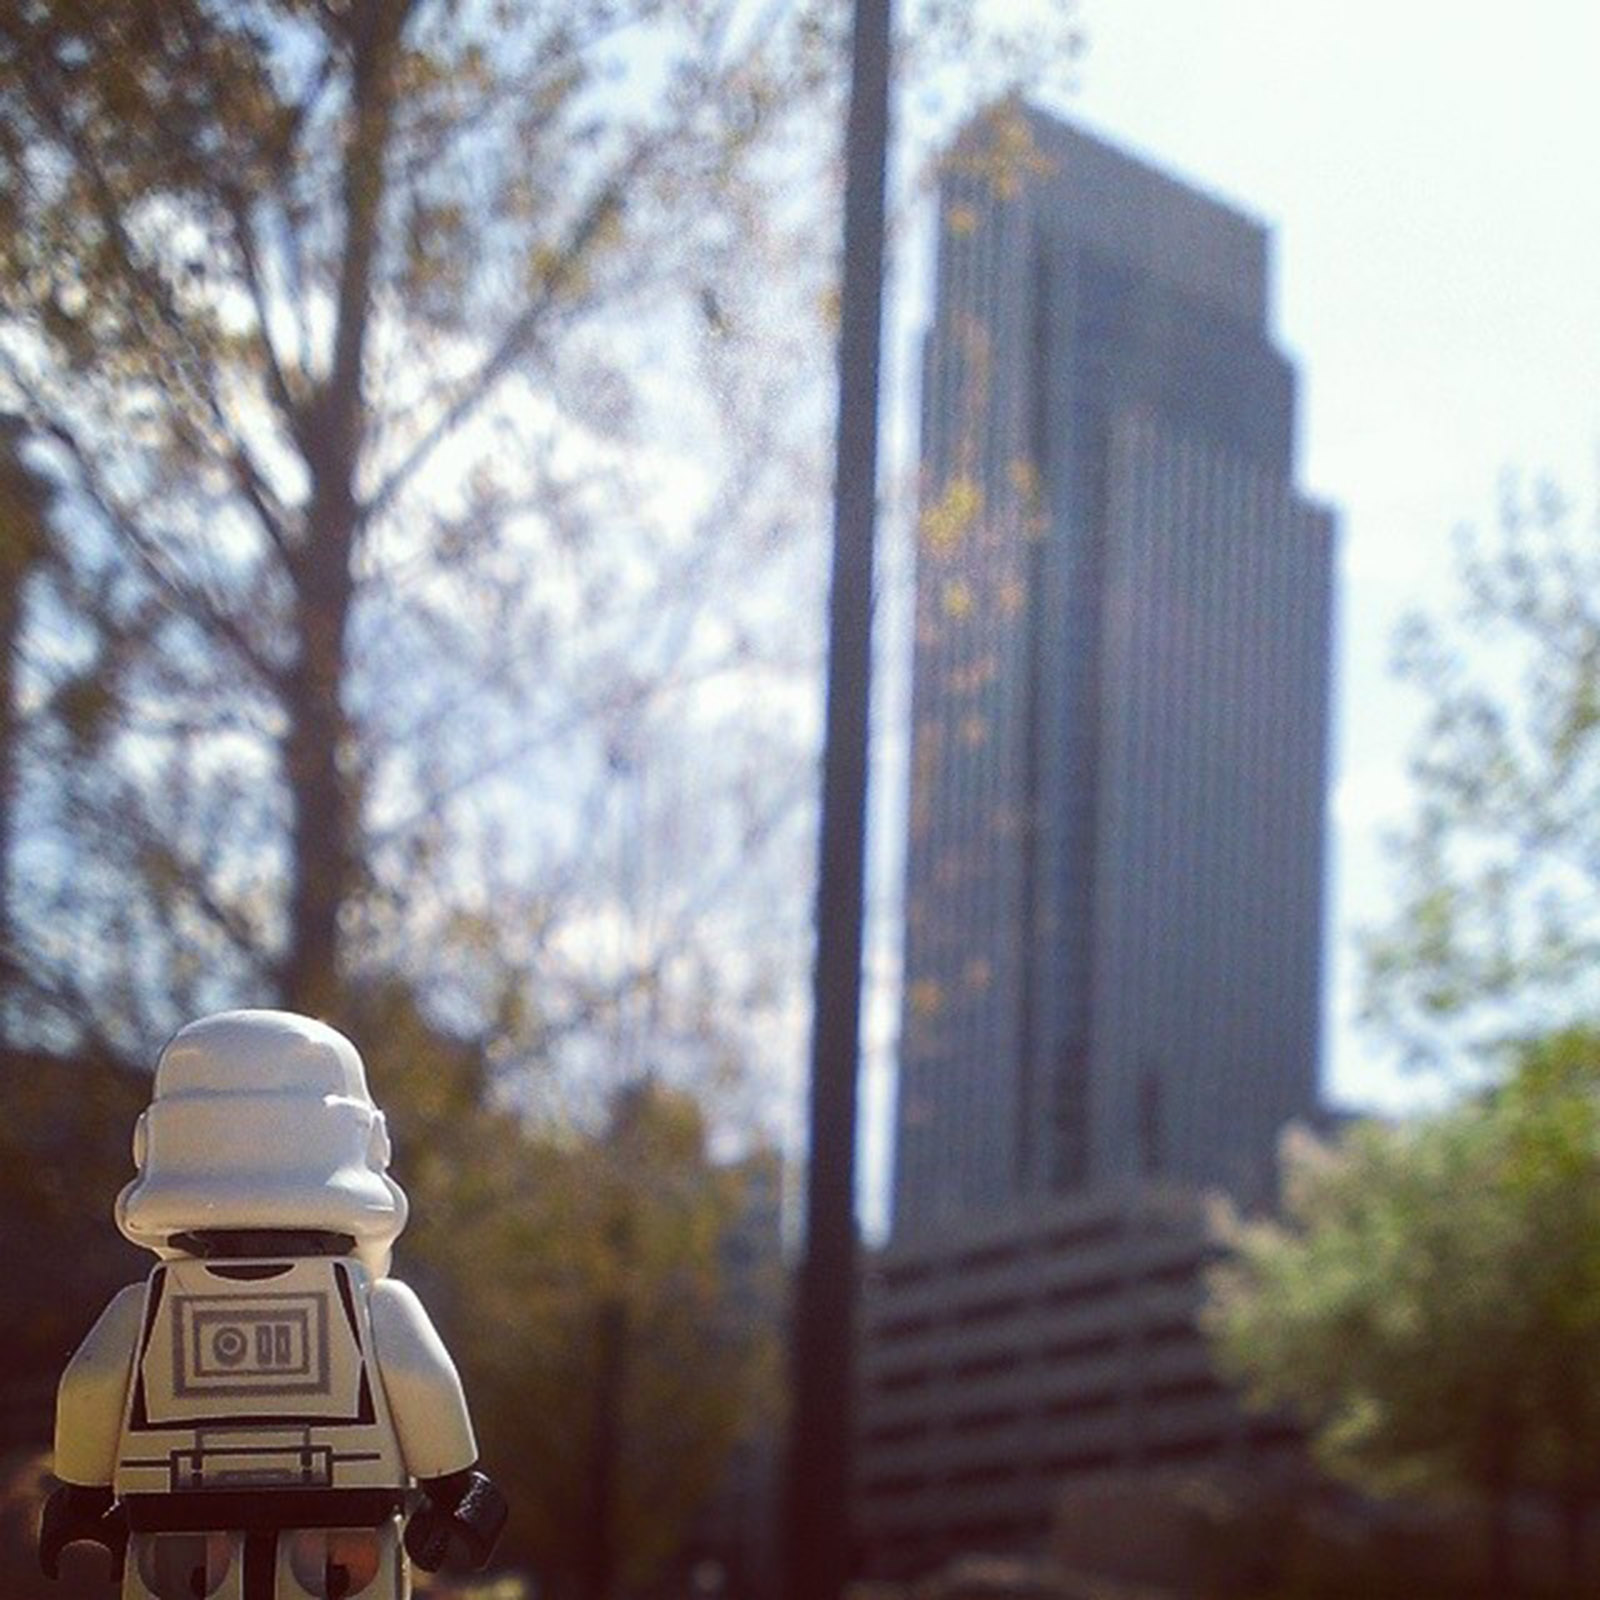 #thelonelytrooper-042.jpg